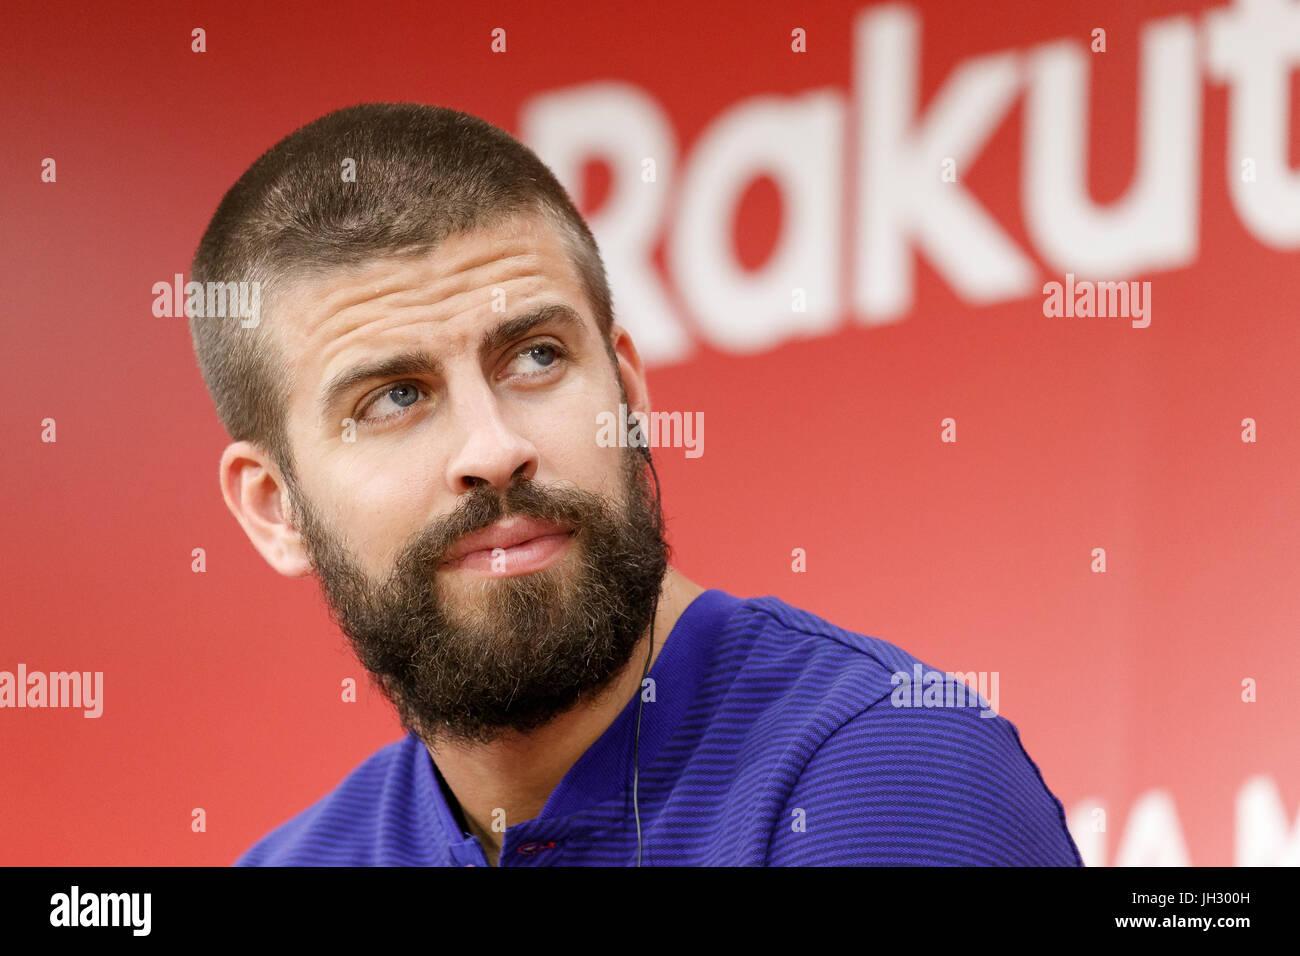 Tokyo, Japan. 13th July, 2017. FC Barcelona player Gerard Pique attends a press event at Rakuten Crimson House headquarters - Stock Image